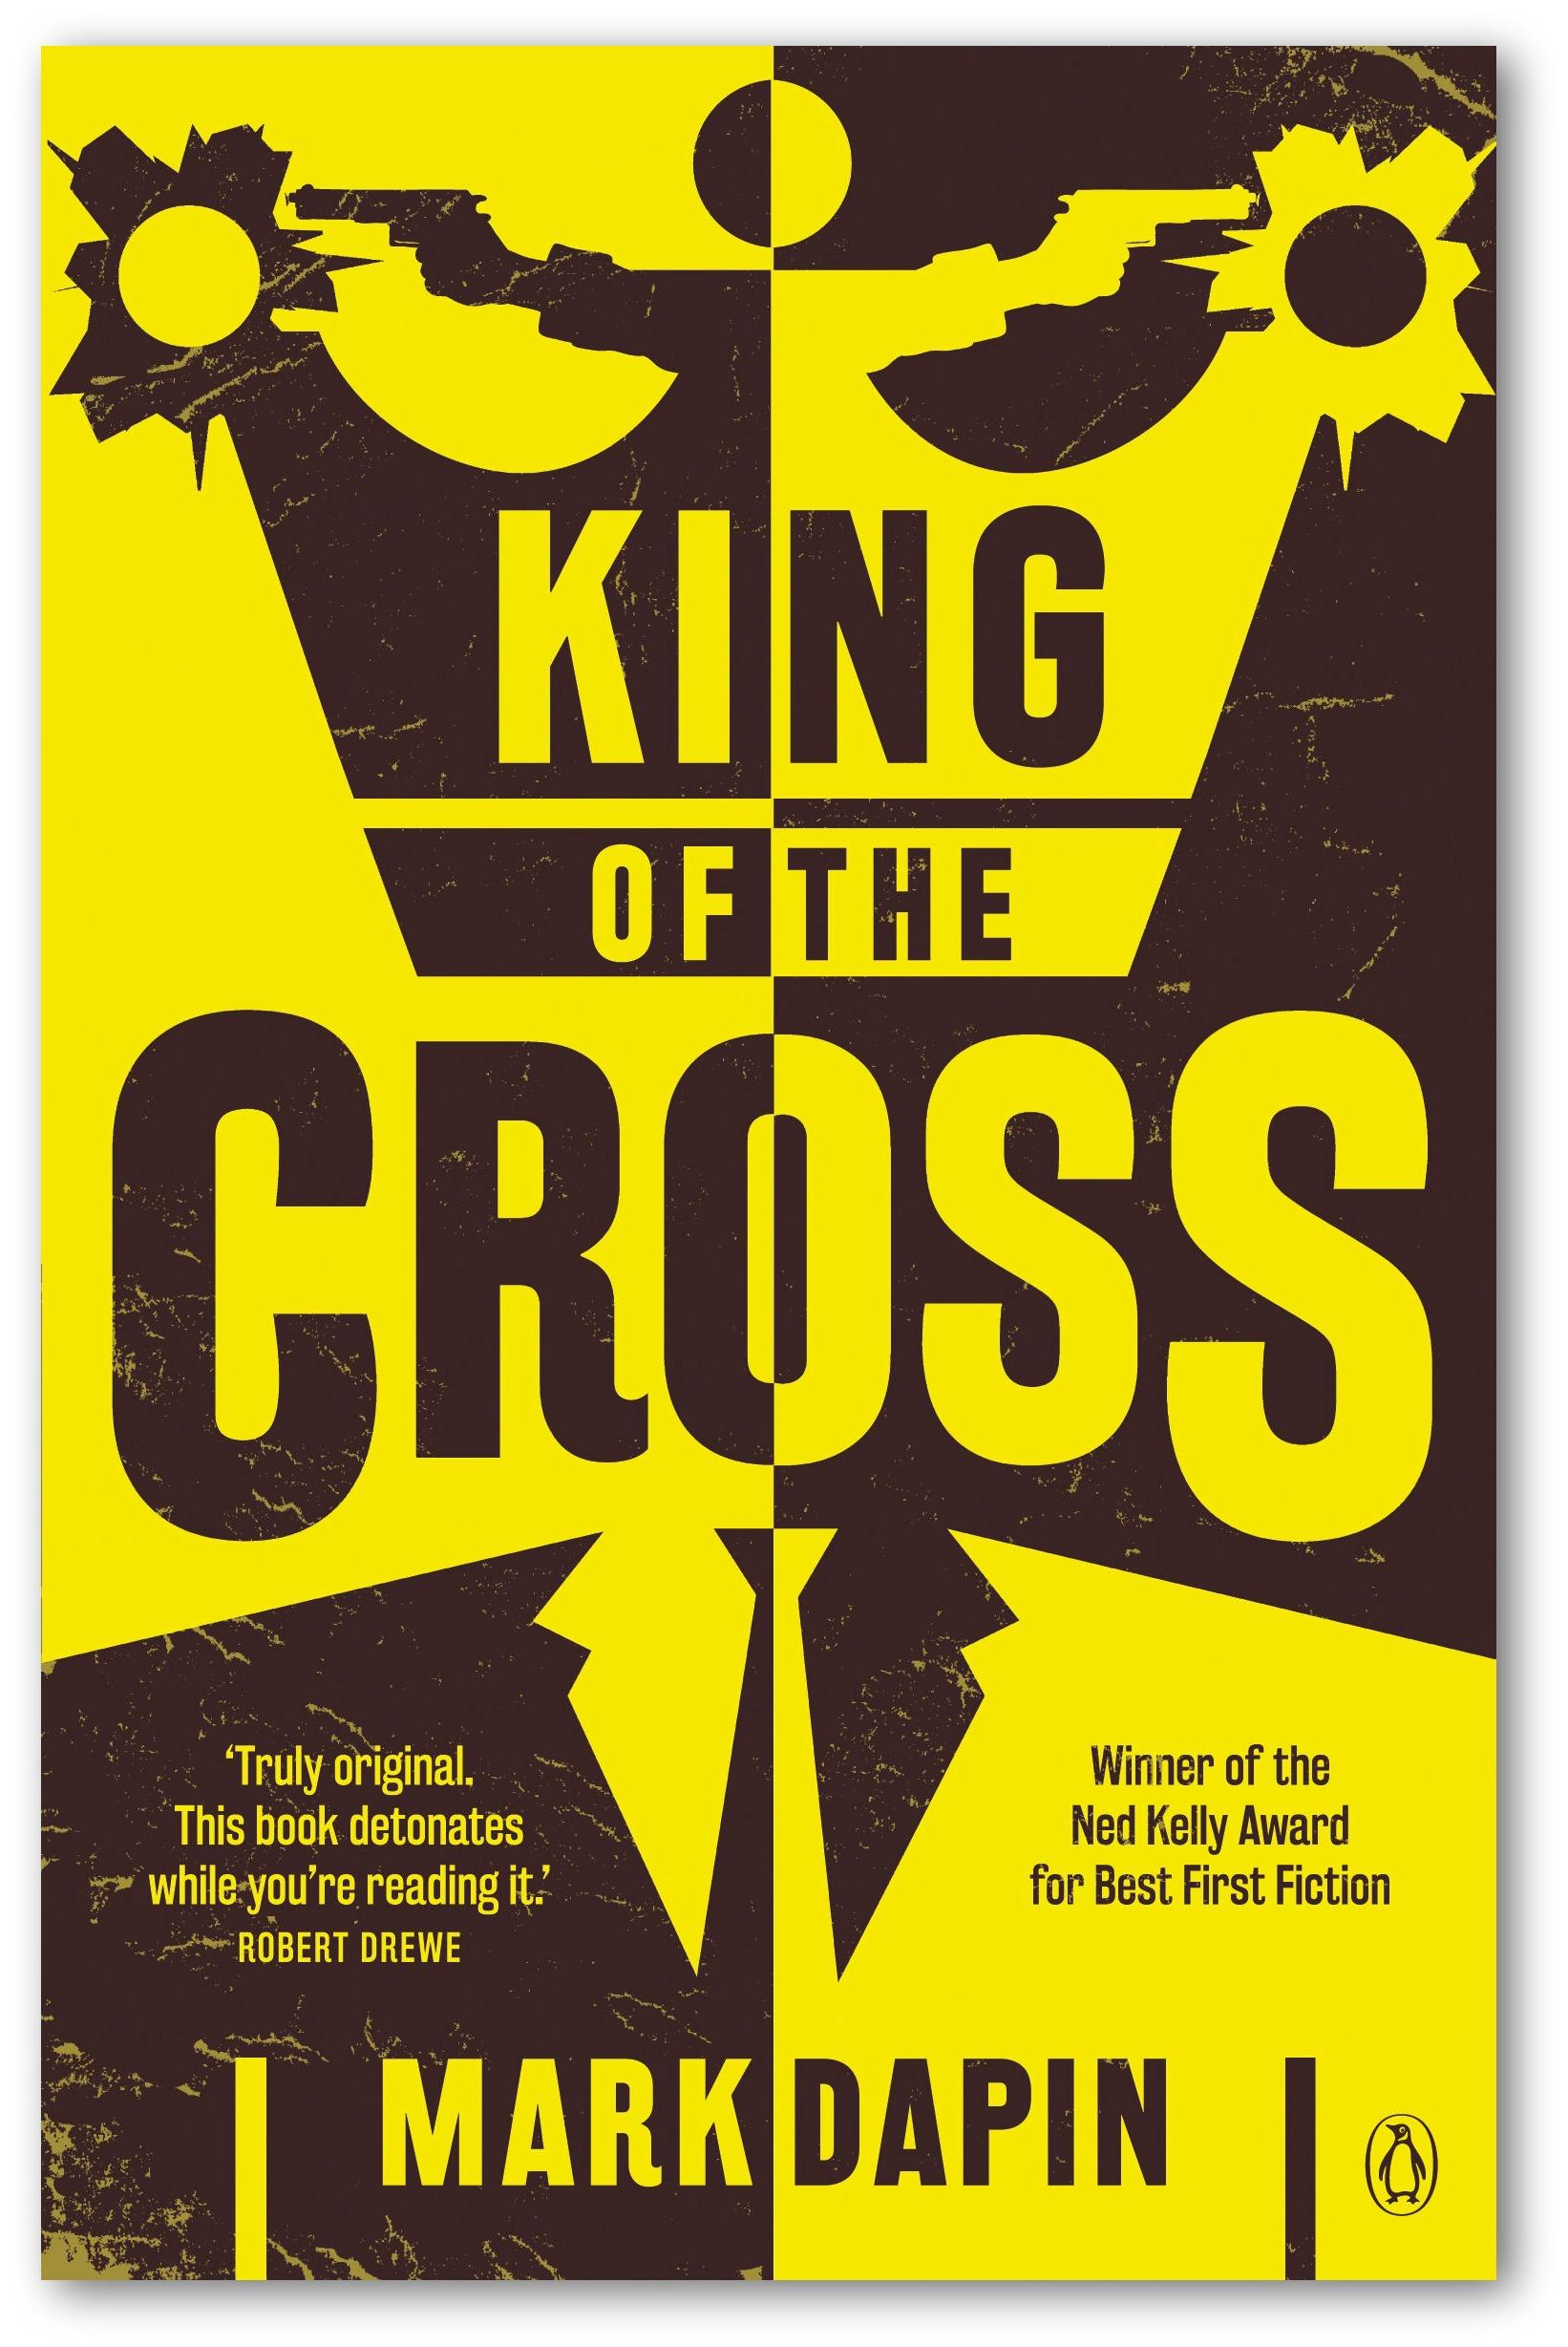 King of the Cross - Penguin drop shadow